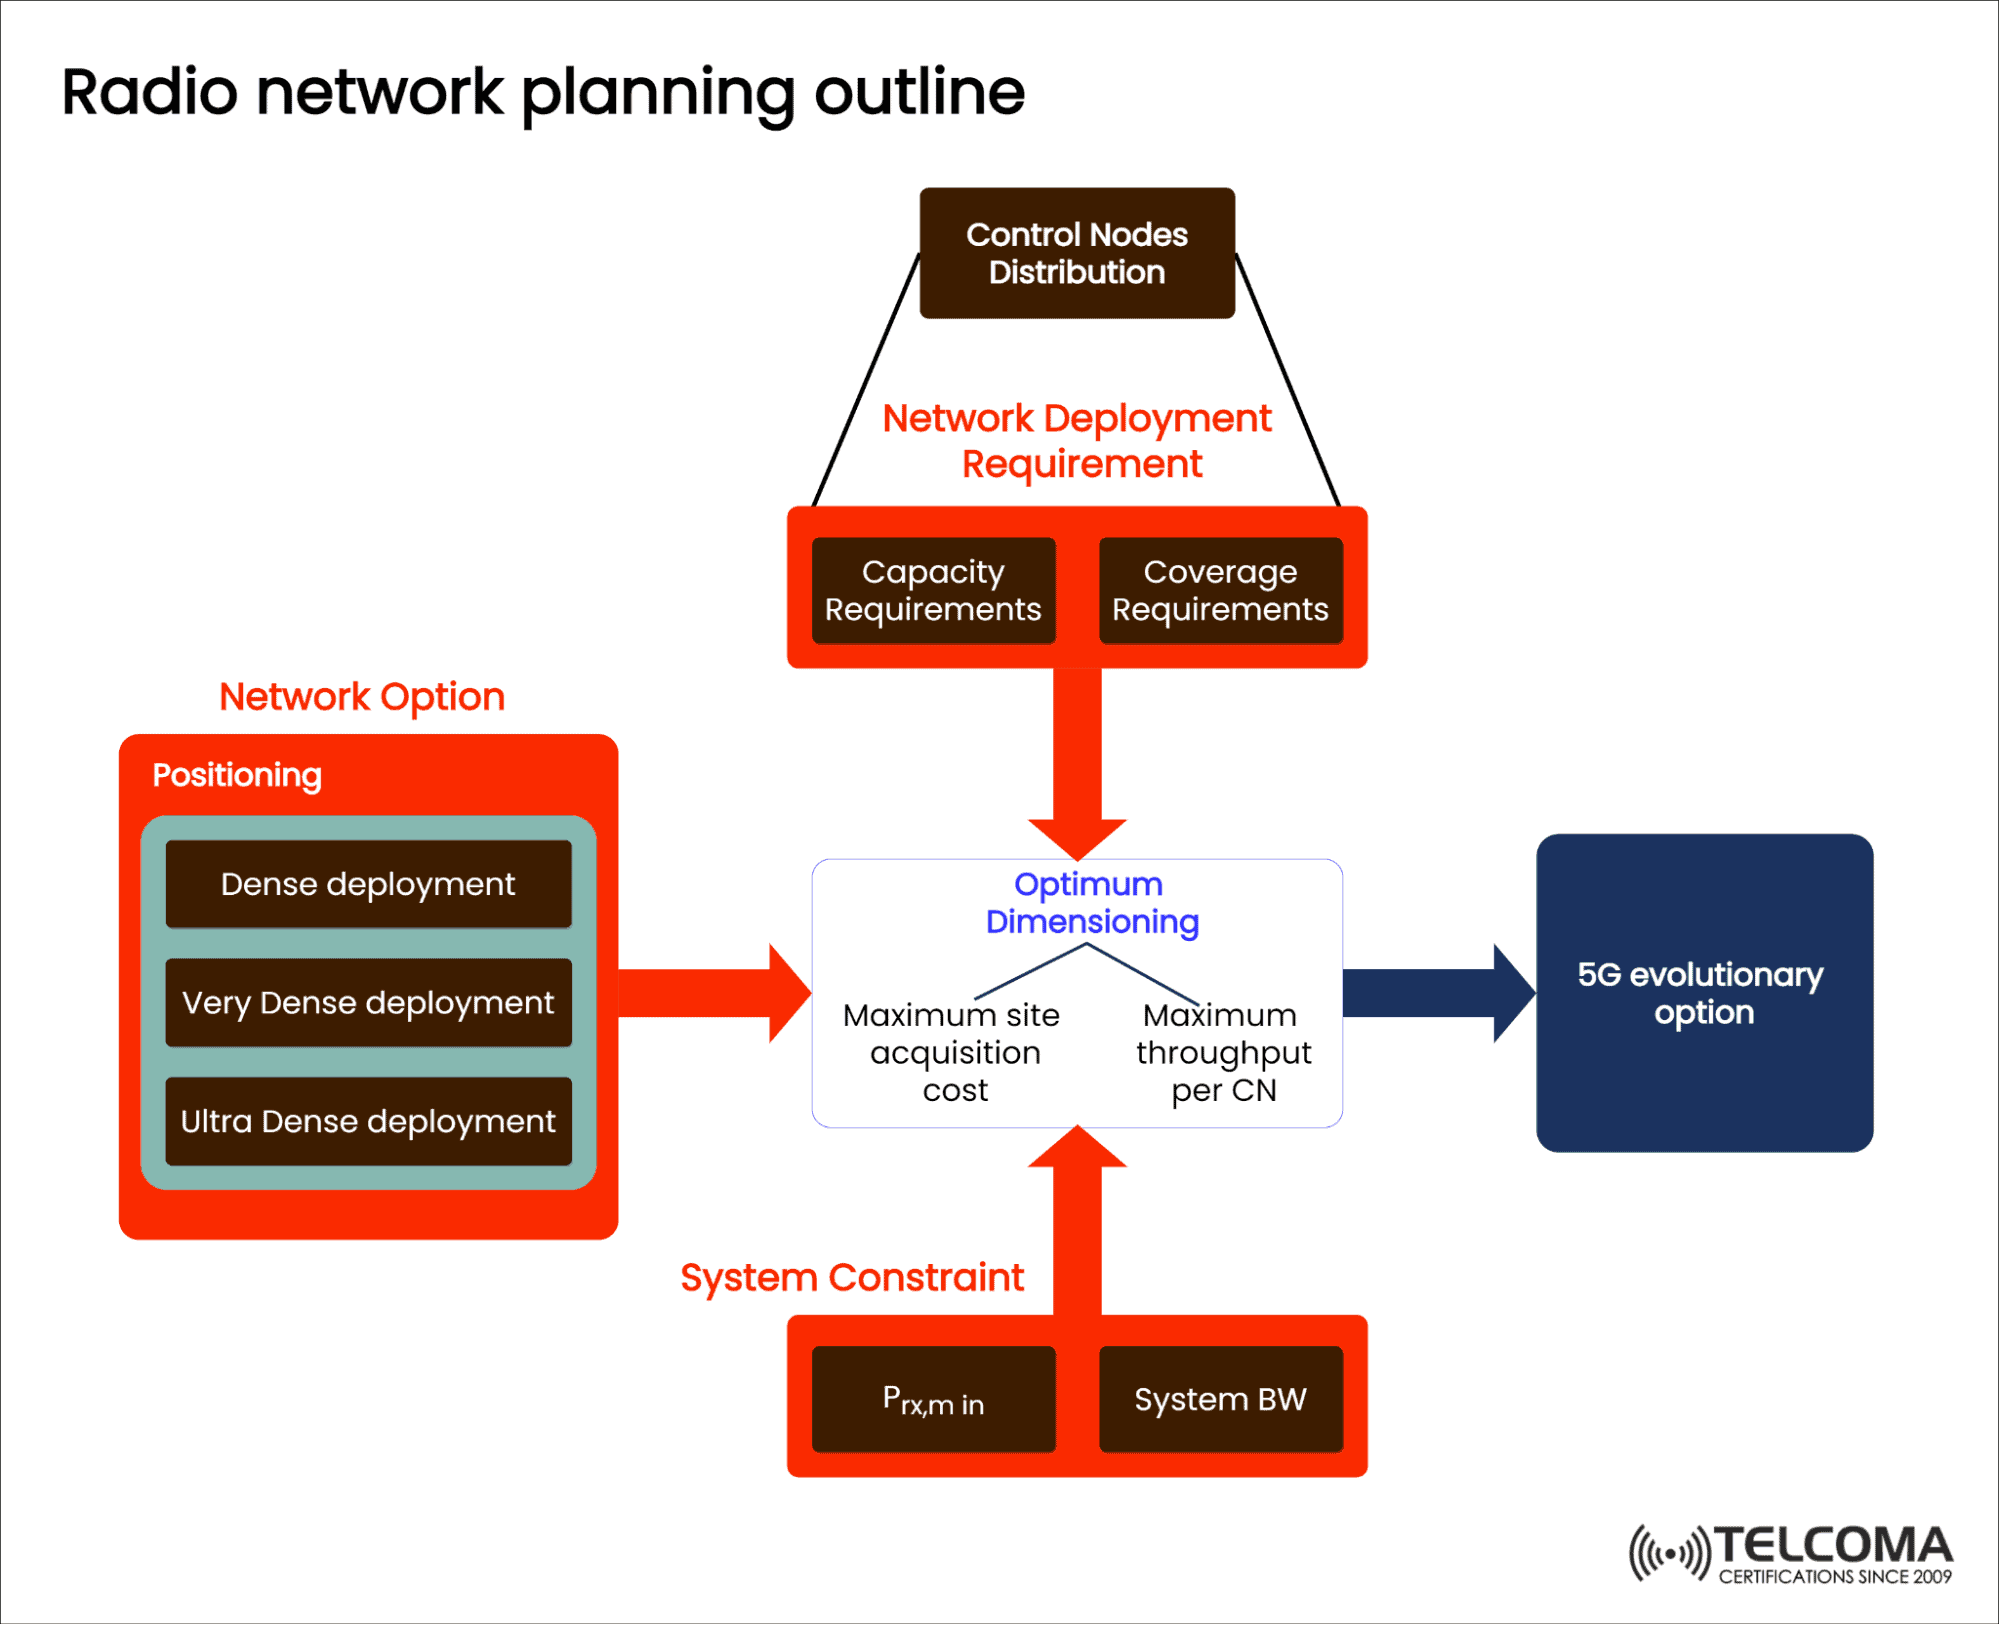 5g radio network planning outline